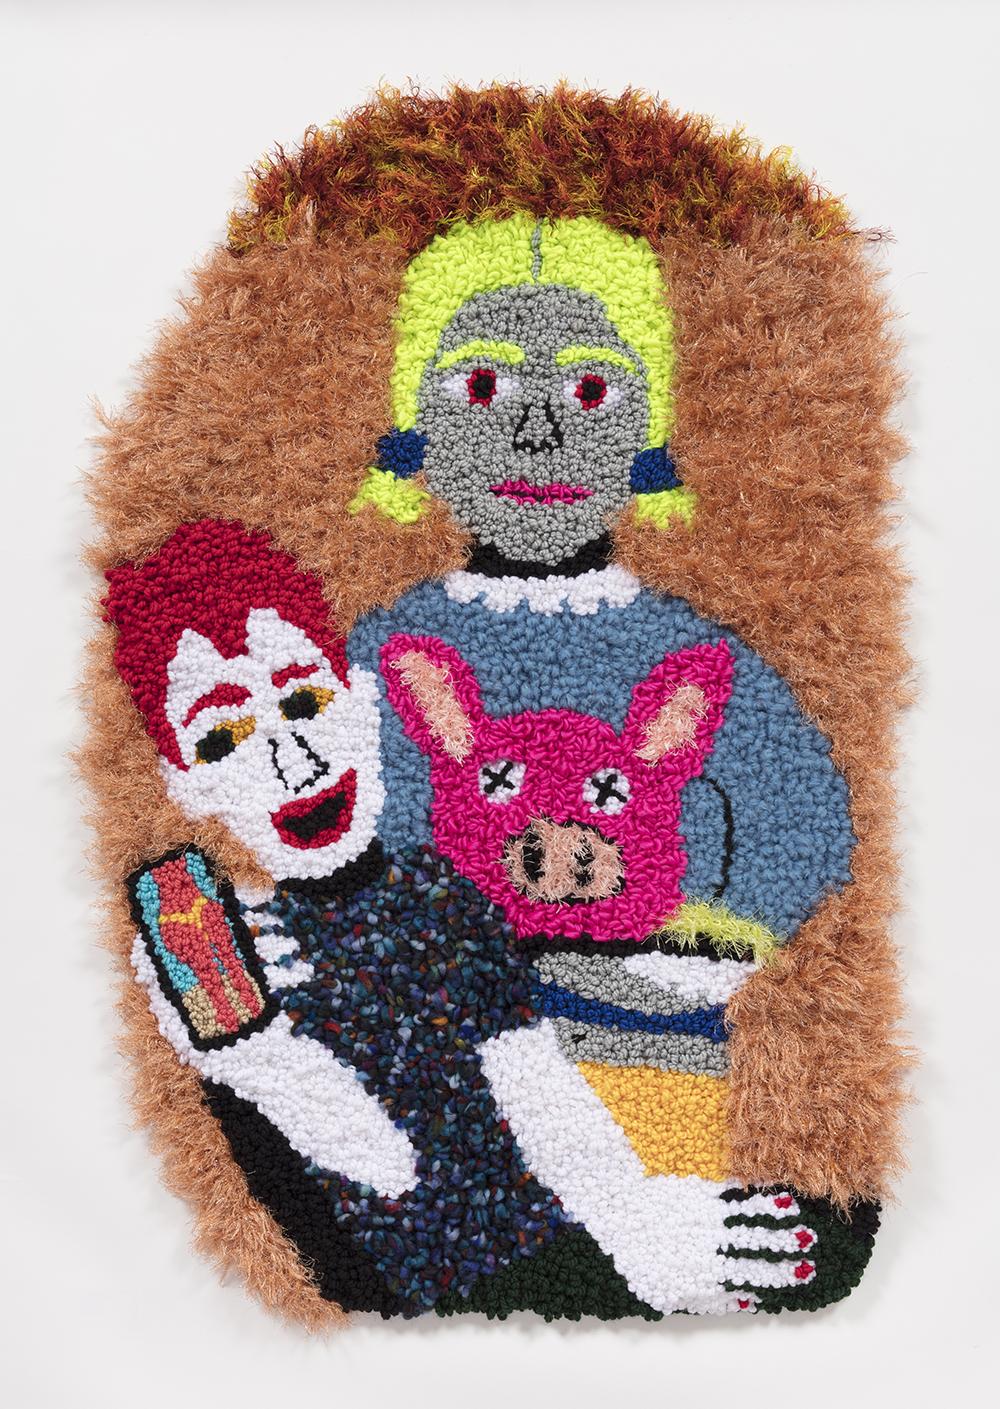 Hannah Epstein. <em>L.A. Pieta</em>, 2019. Wool, acrylic, polyester and burlap, 43 1/2 x 28 inches  (110.5 x 71.1 cm)